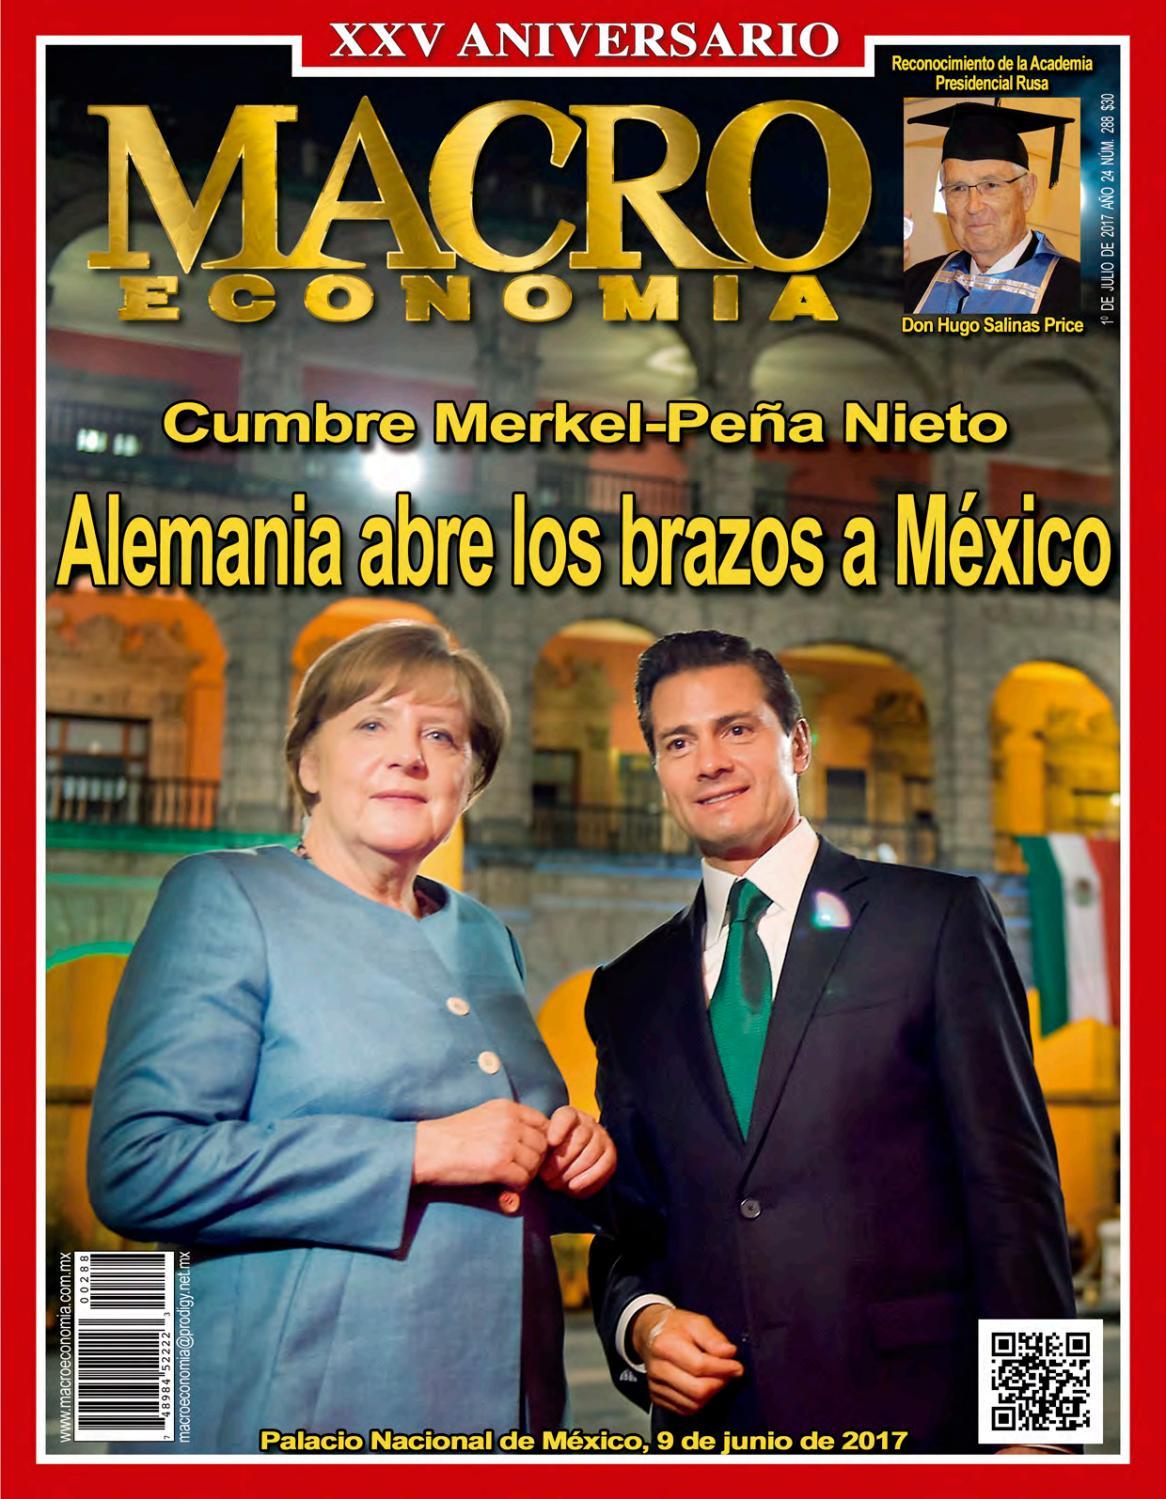 c777f898e763 Macroeconomia 288 by Macro Economia - issuu